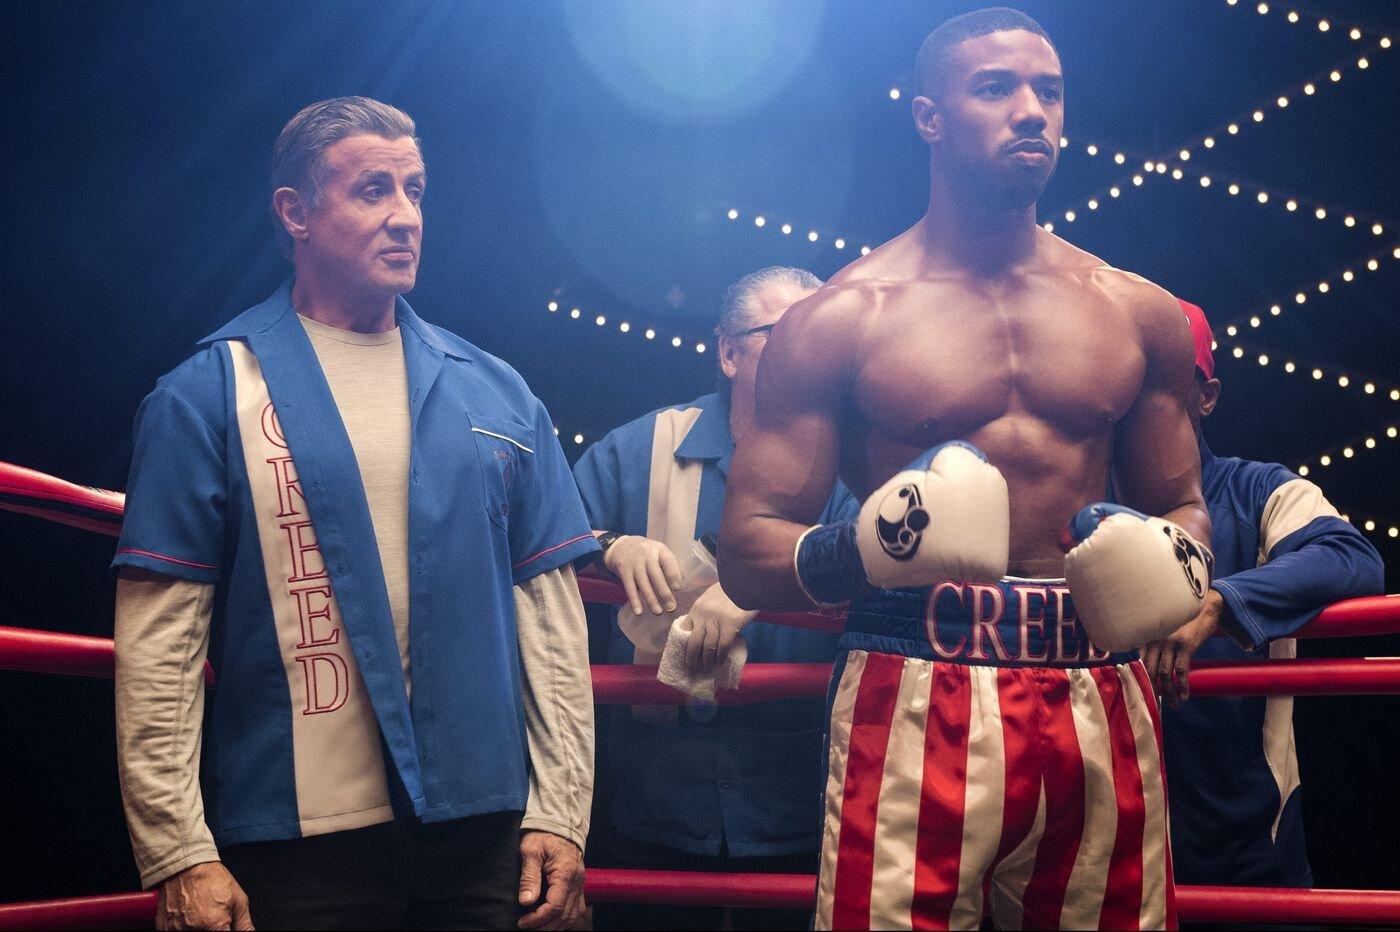 Michael B. Jordan to Direct Creed III , Costar Tessa Thompson Says